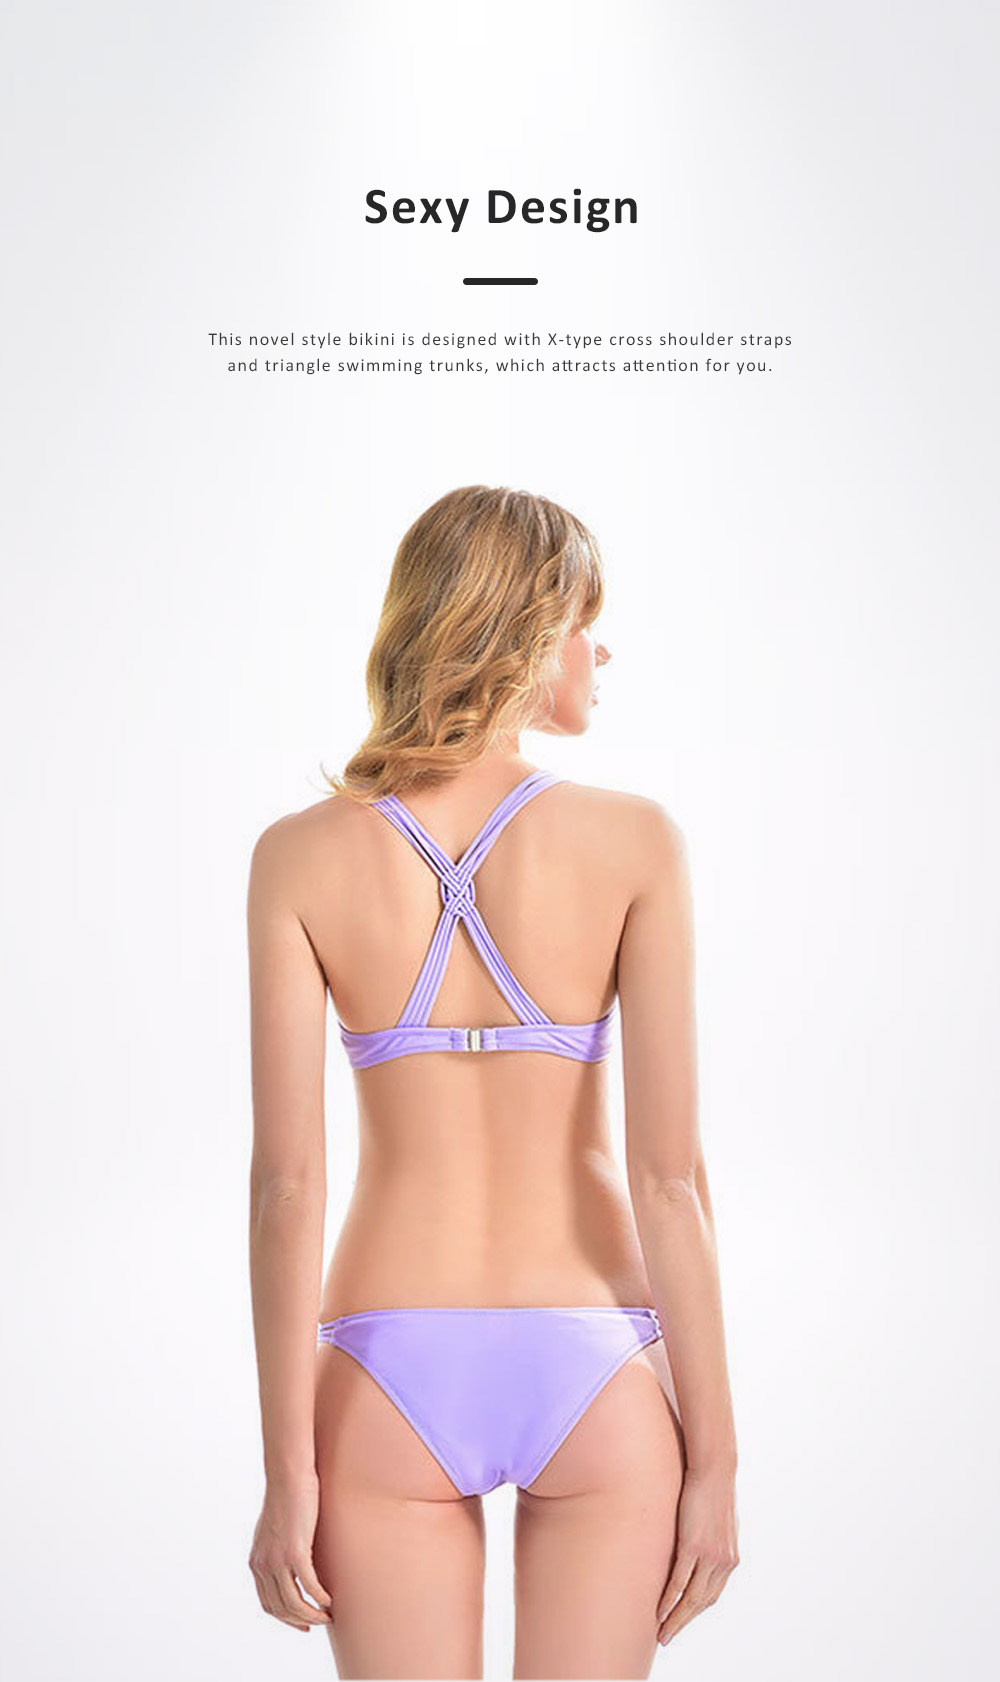 2019 Sexy Trim Fit Bikini for Young Girls, Light Purple Pure Sexy Split Design Swimwear Suit, Two-piece Separated Type Bikini 2